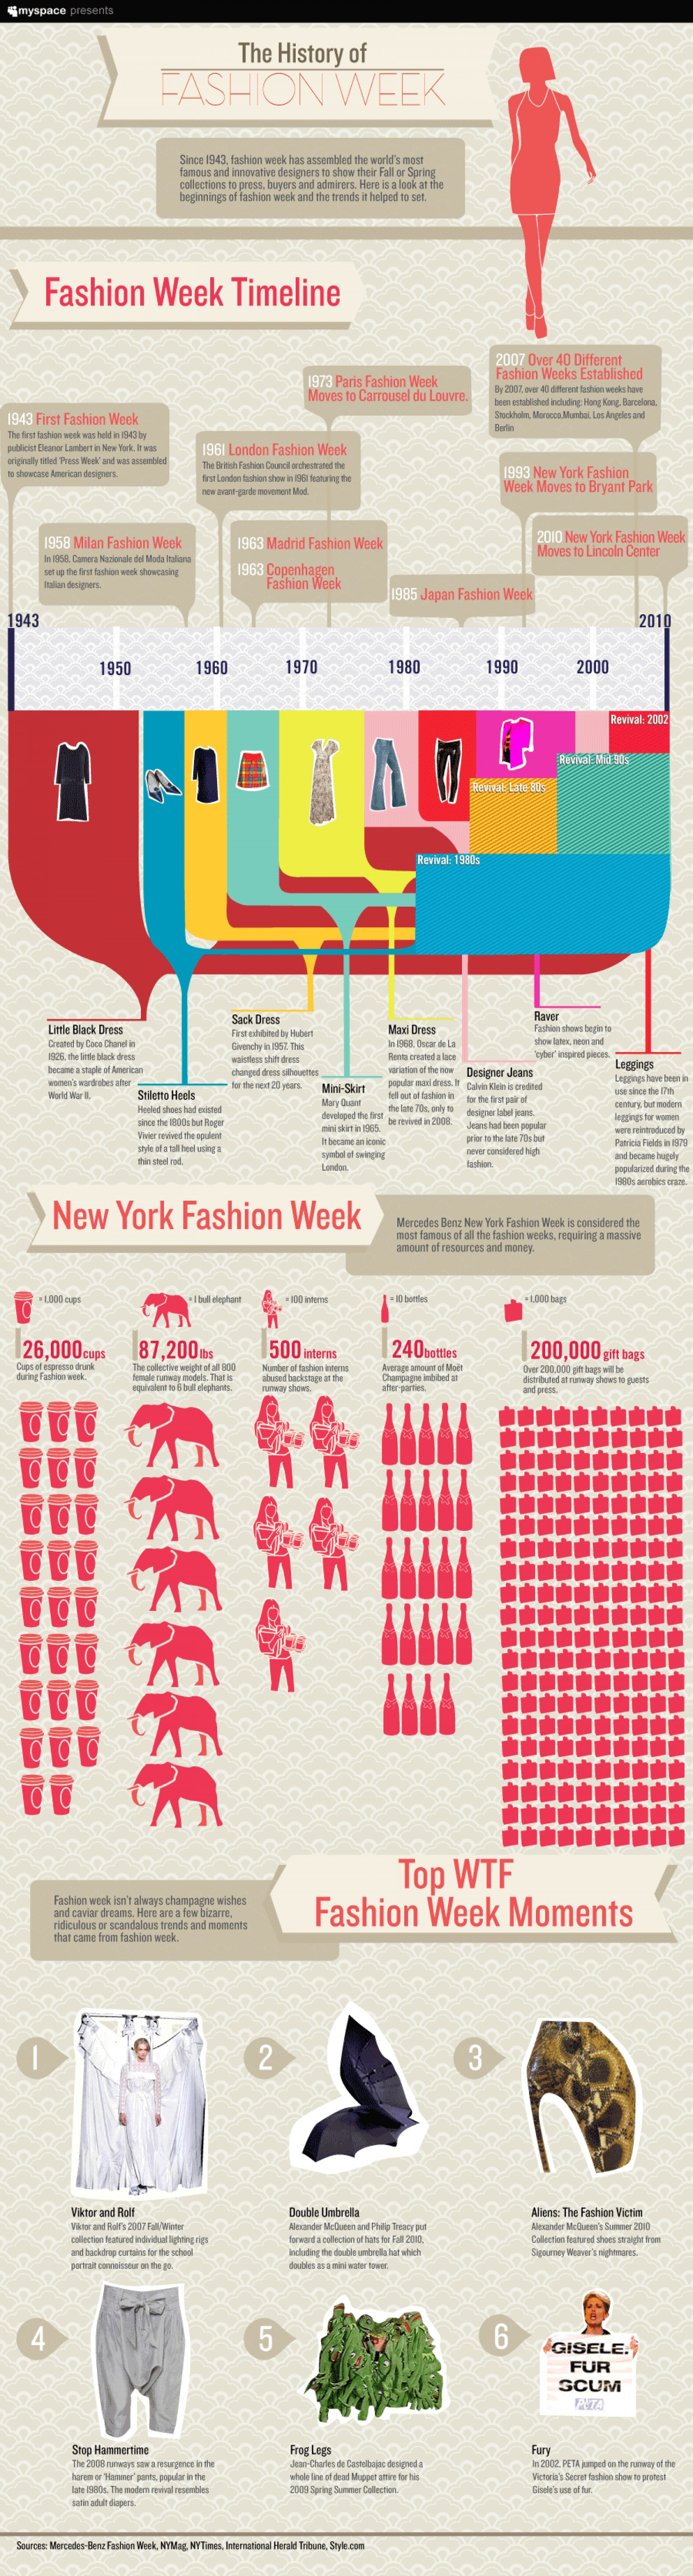 13. First Fashion Week